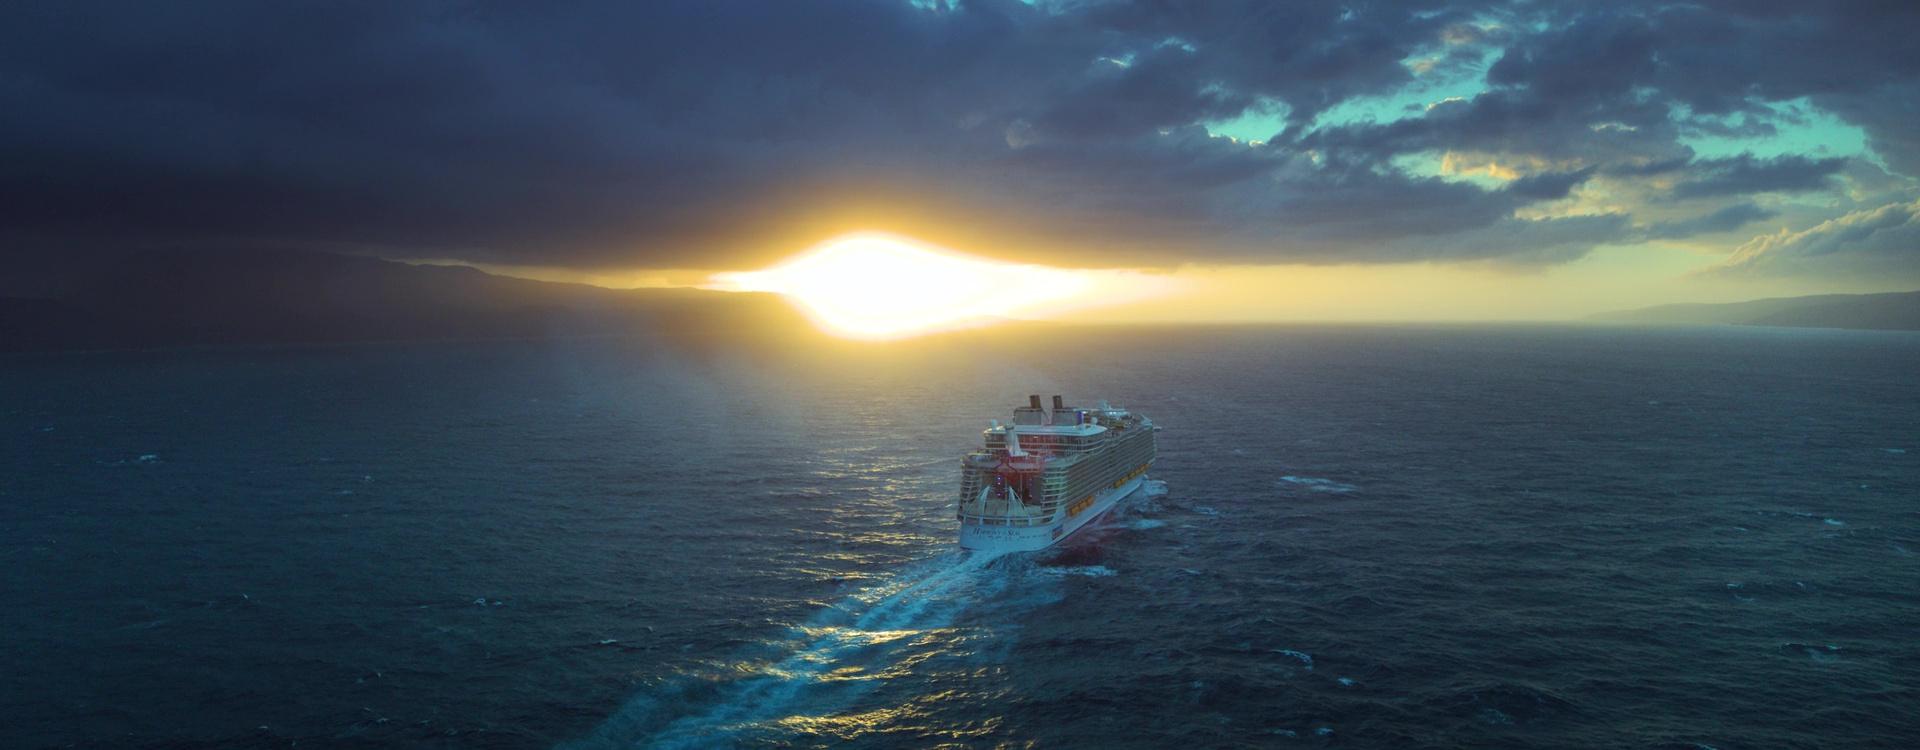 Royal Caribbean International Ms Harmony Of The Seas Oasis